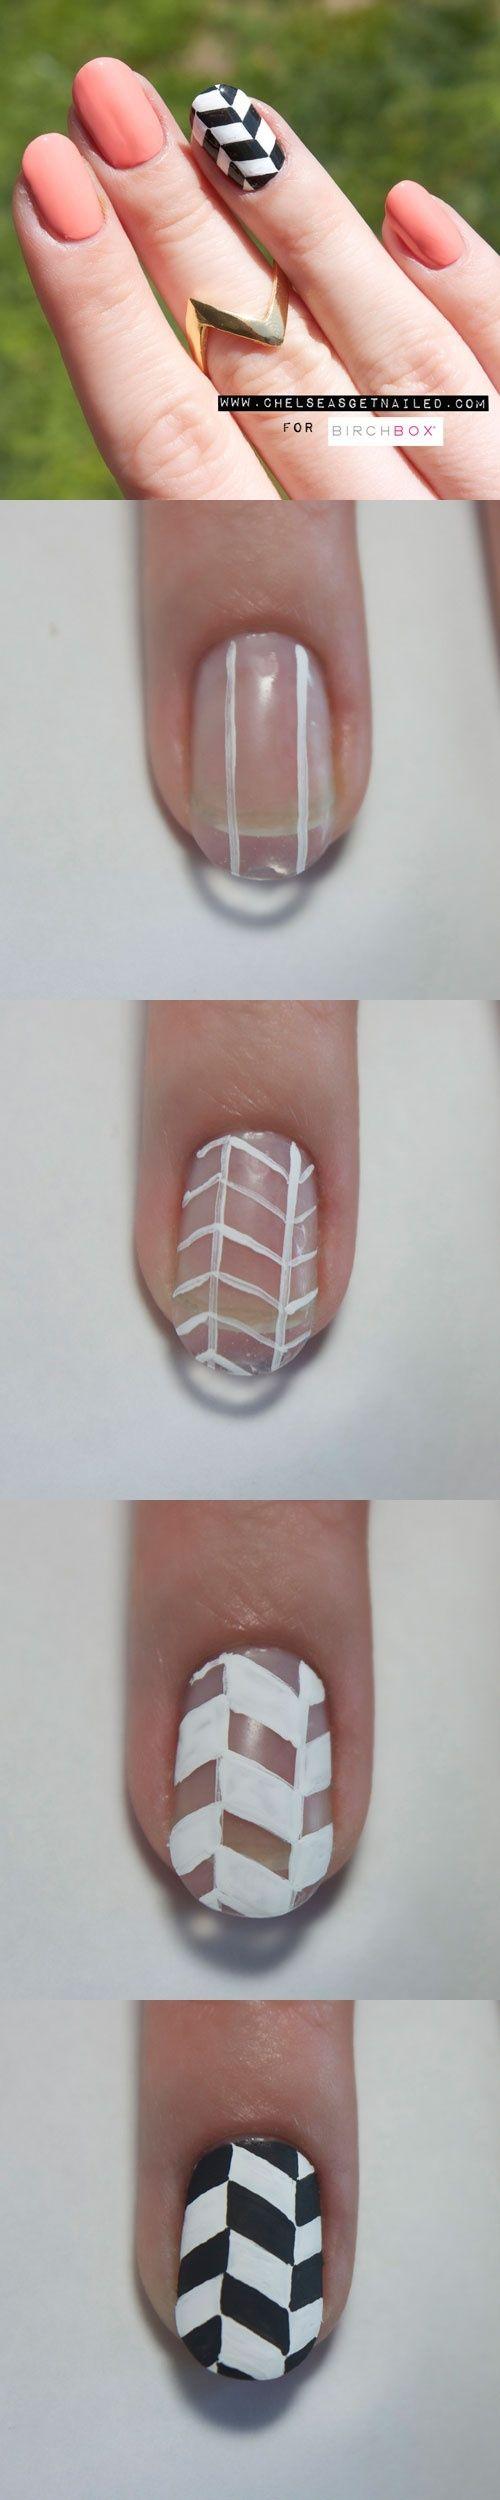 chevron nail art nicolson.araya